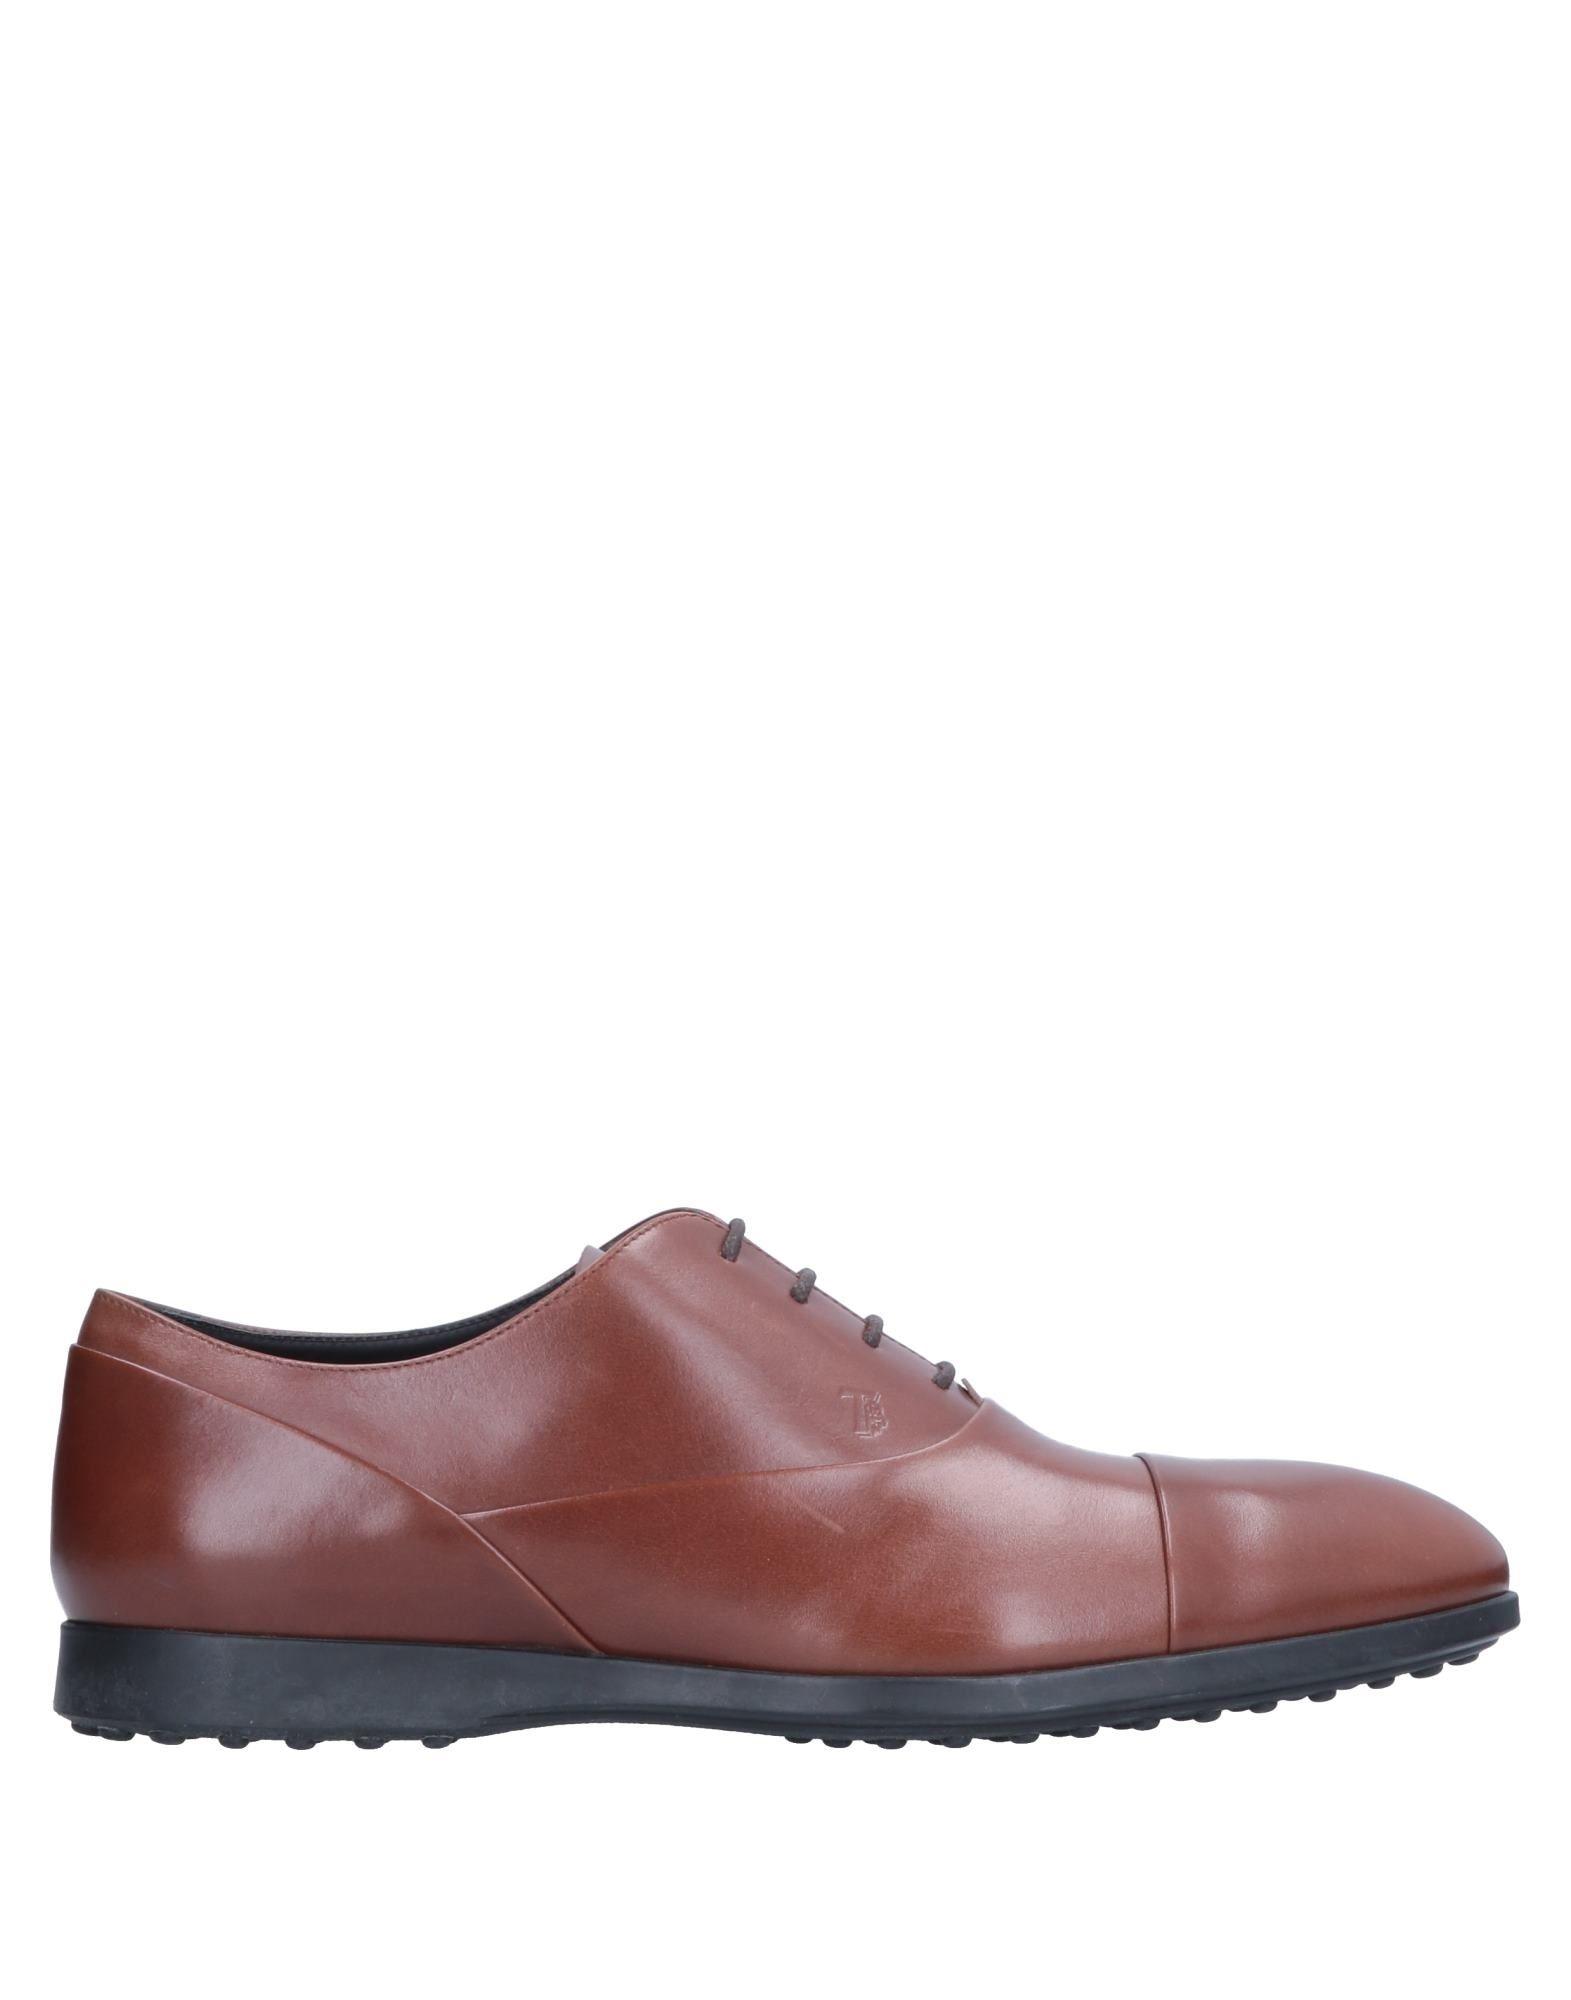 Tod's Schnürschuhe Herren  11541918PK Gute Qualität beliebte Schuhe